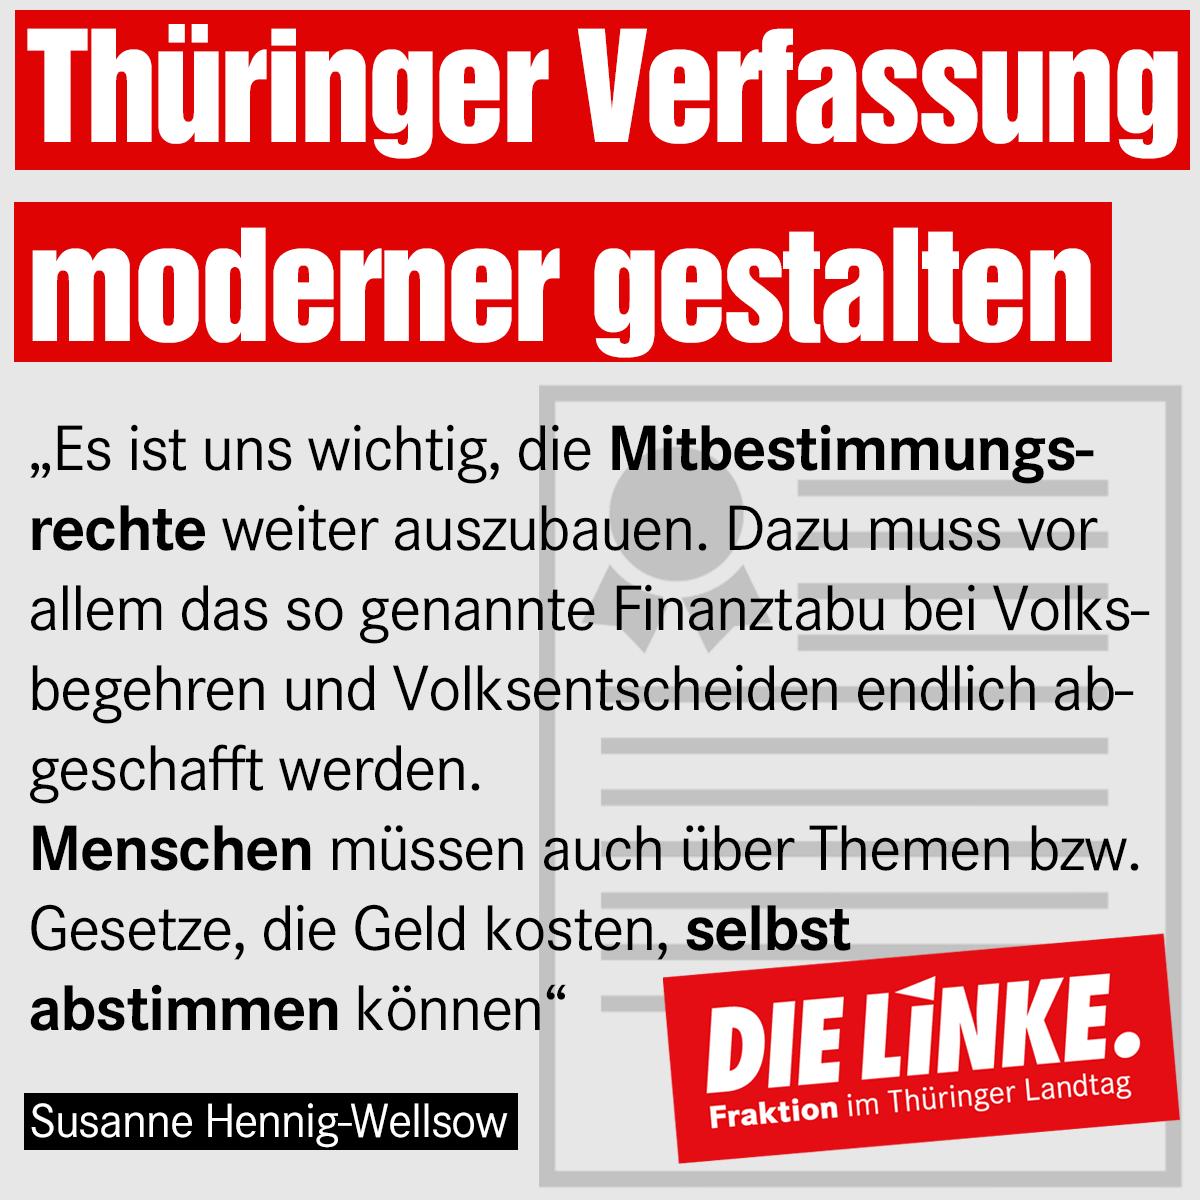 Thüringer Verfassung